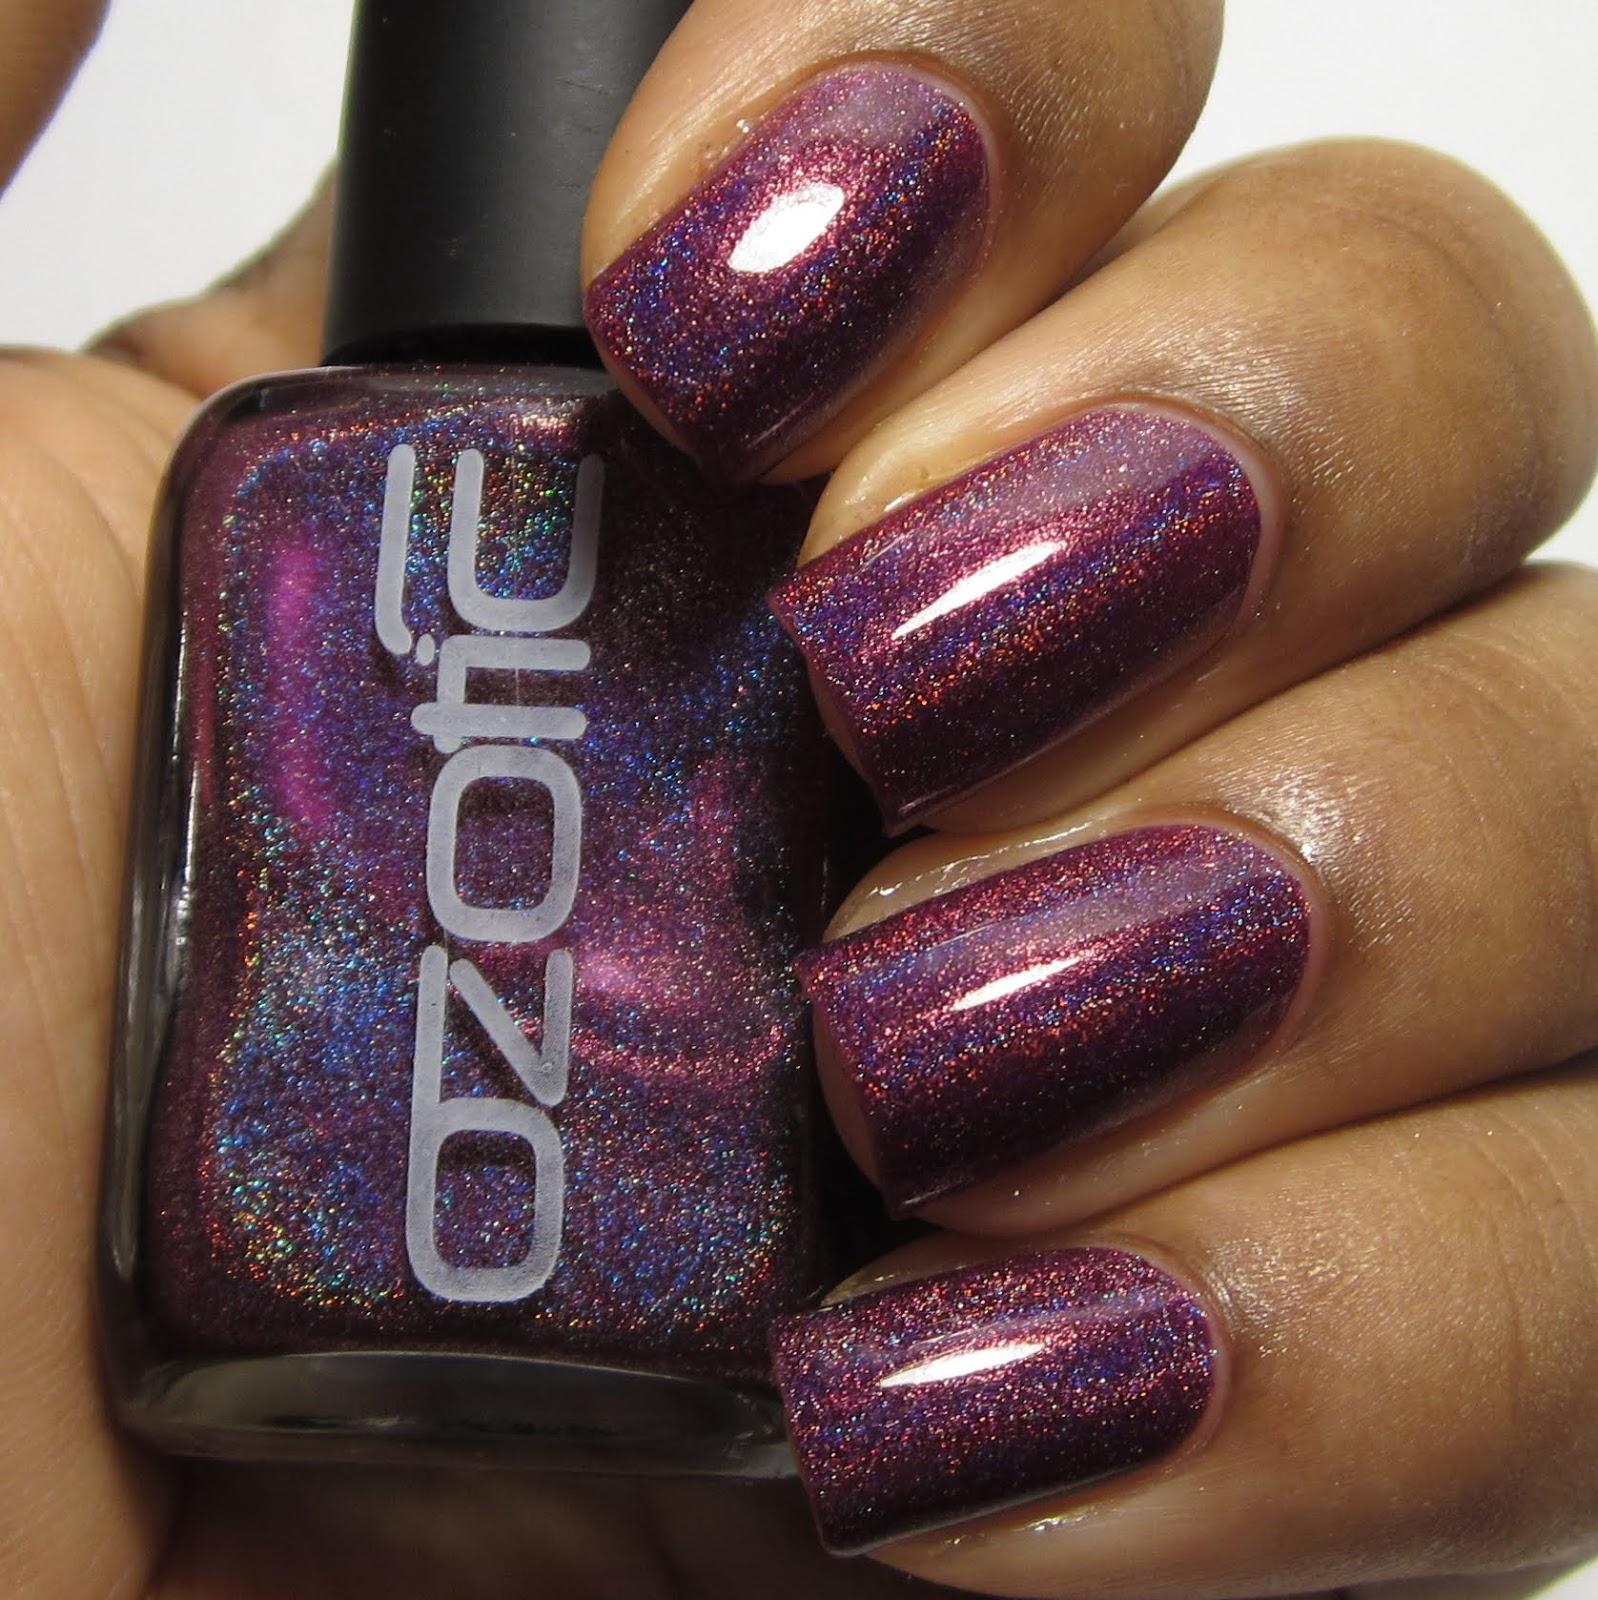 Ozotic Pro 513 holo nail polish swatch